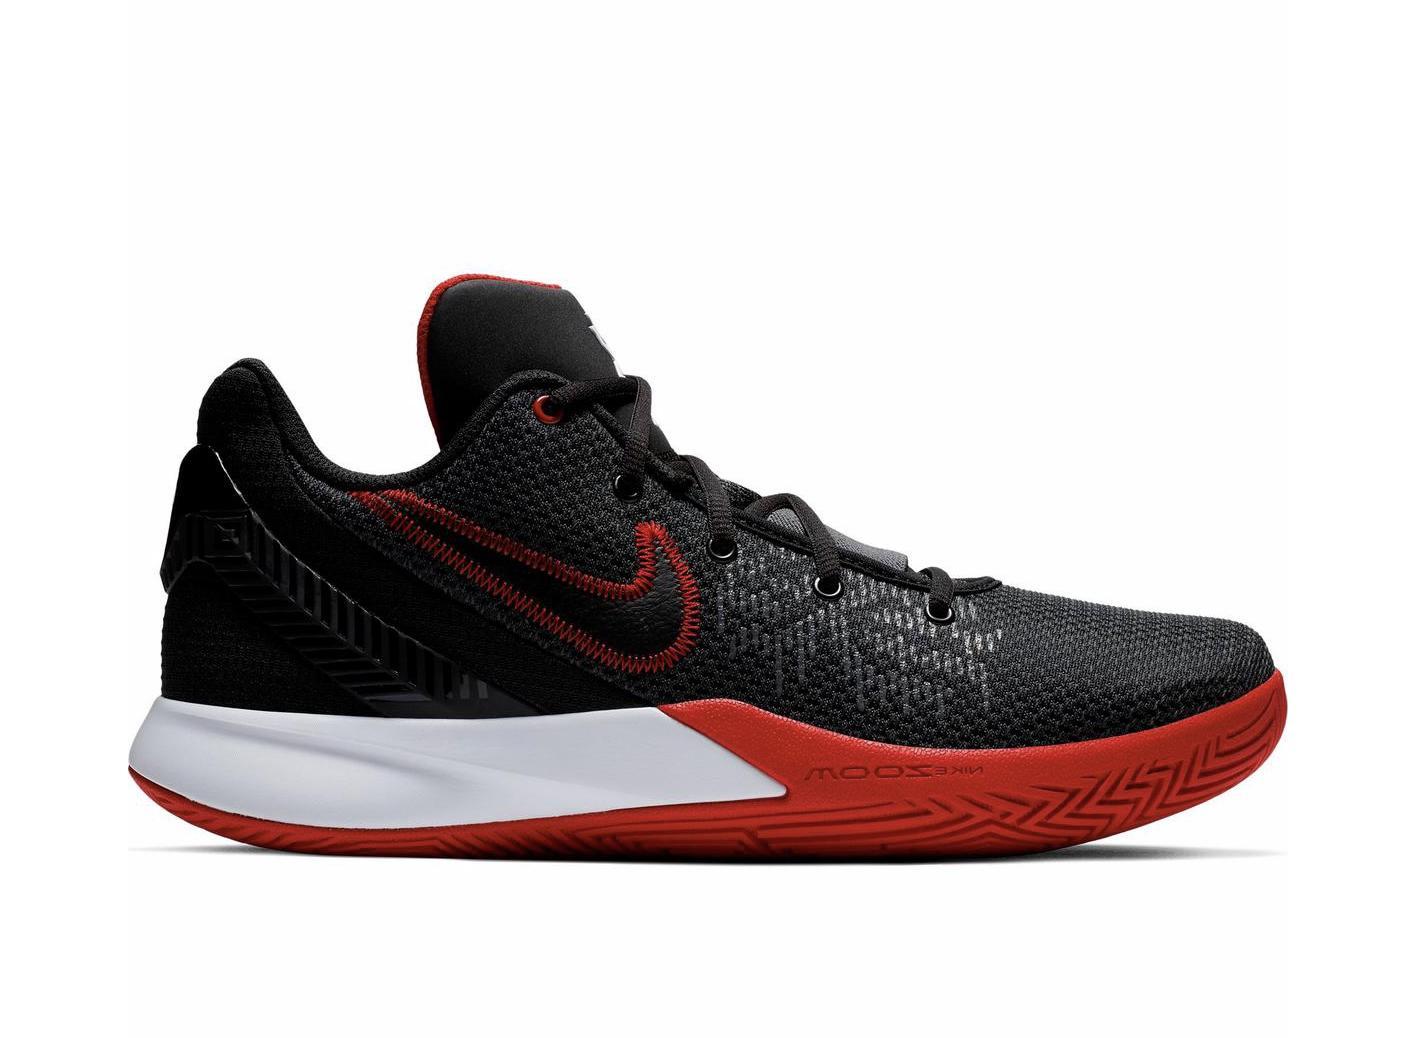 Nike 2, Mens Size: 10.5 Basketball Red/Black